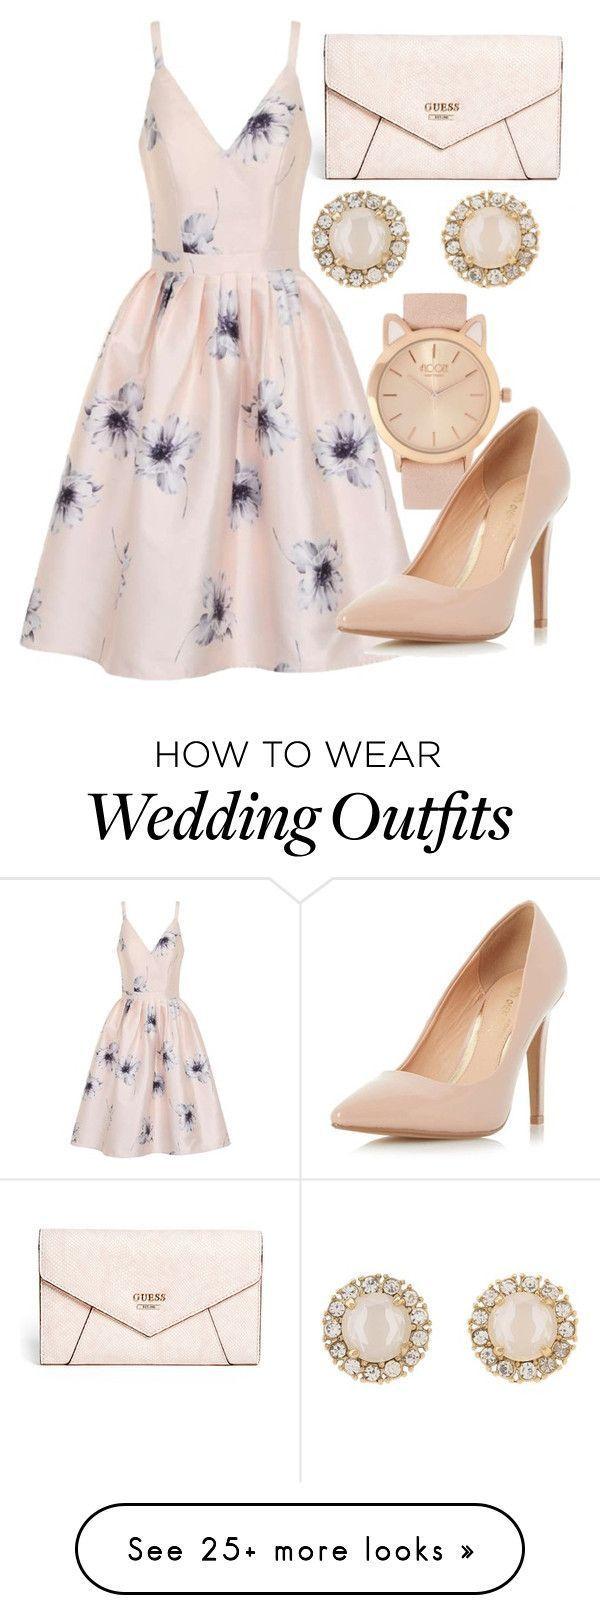 39++ Cute dresses to wear to a wedding ideas ideas